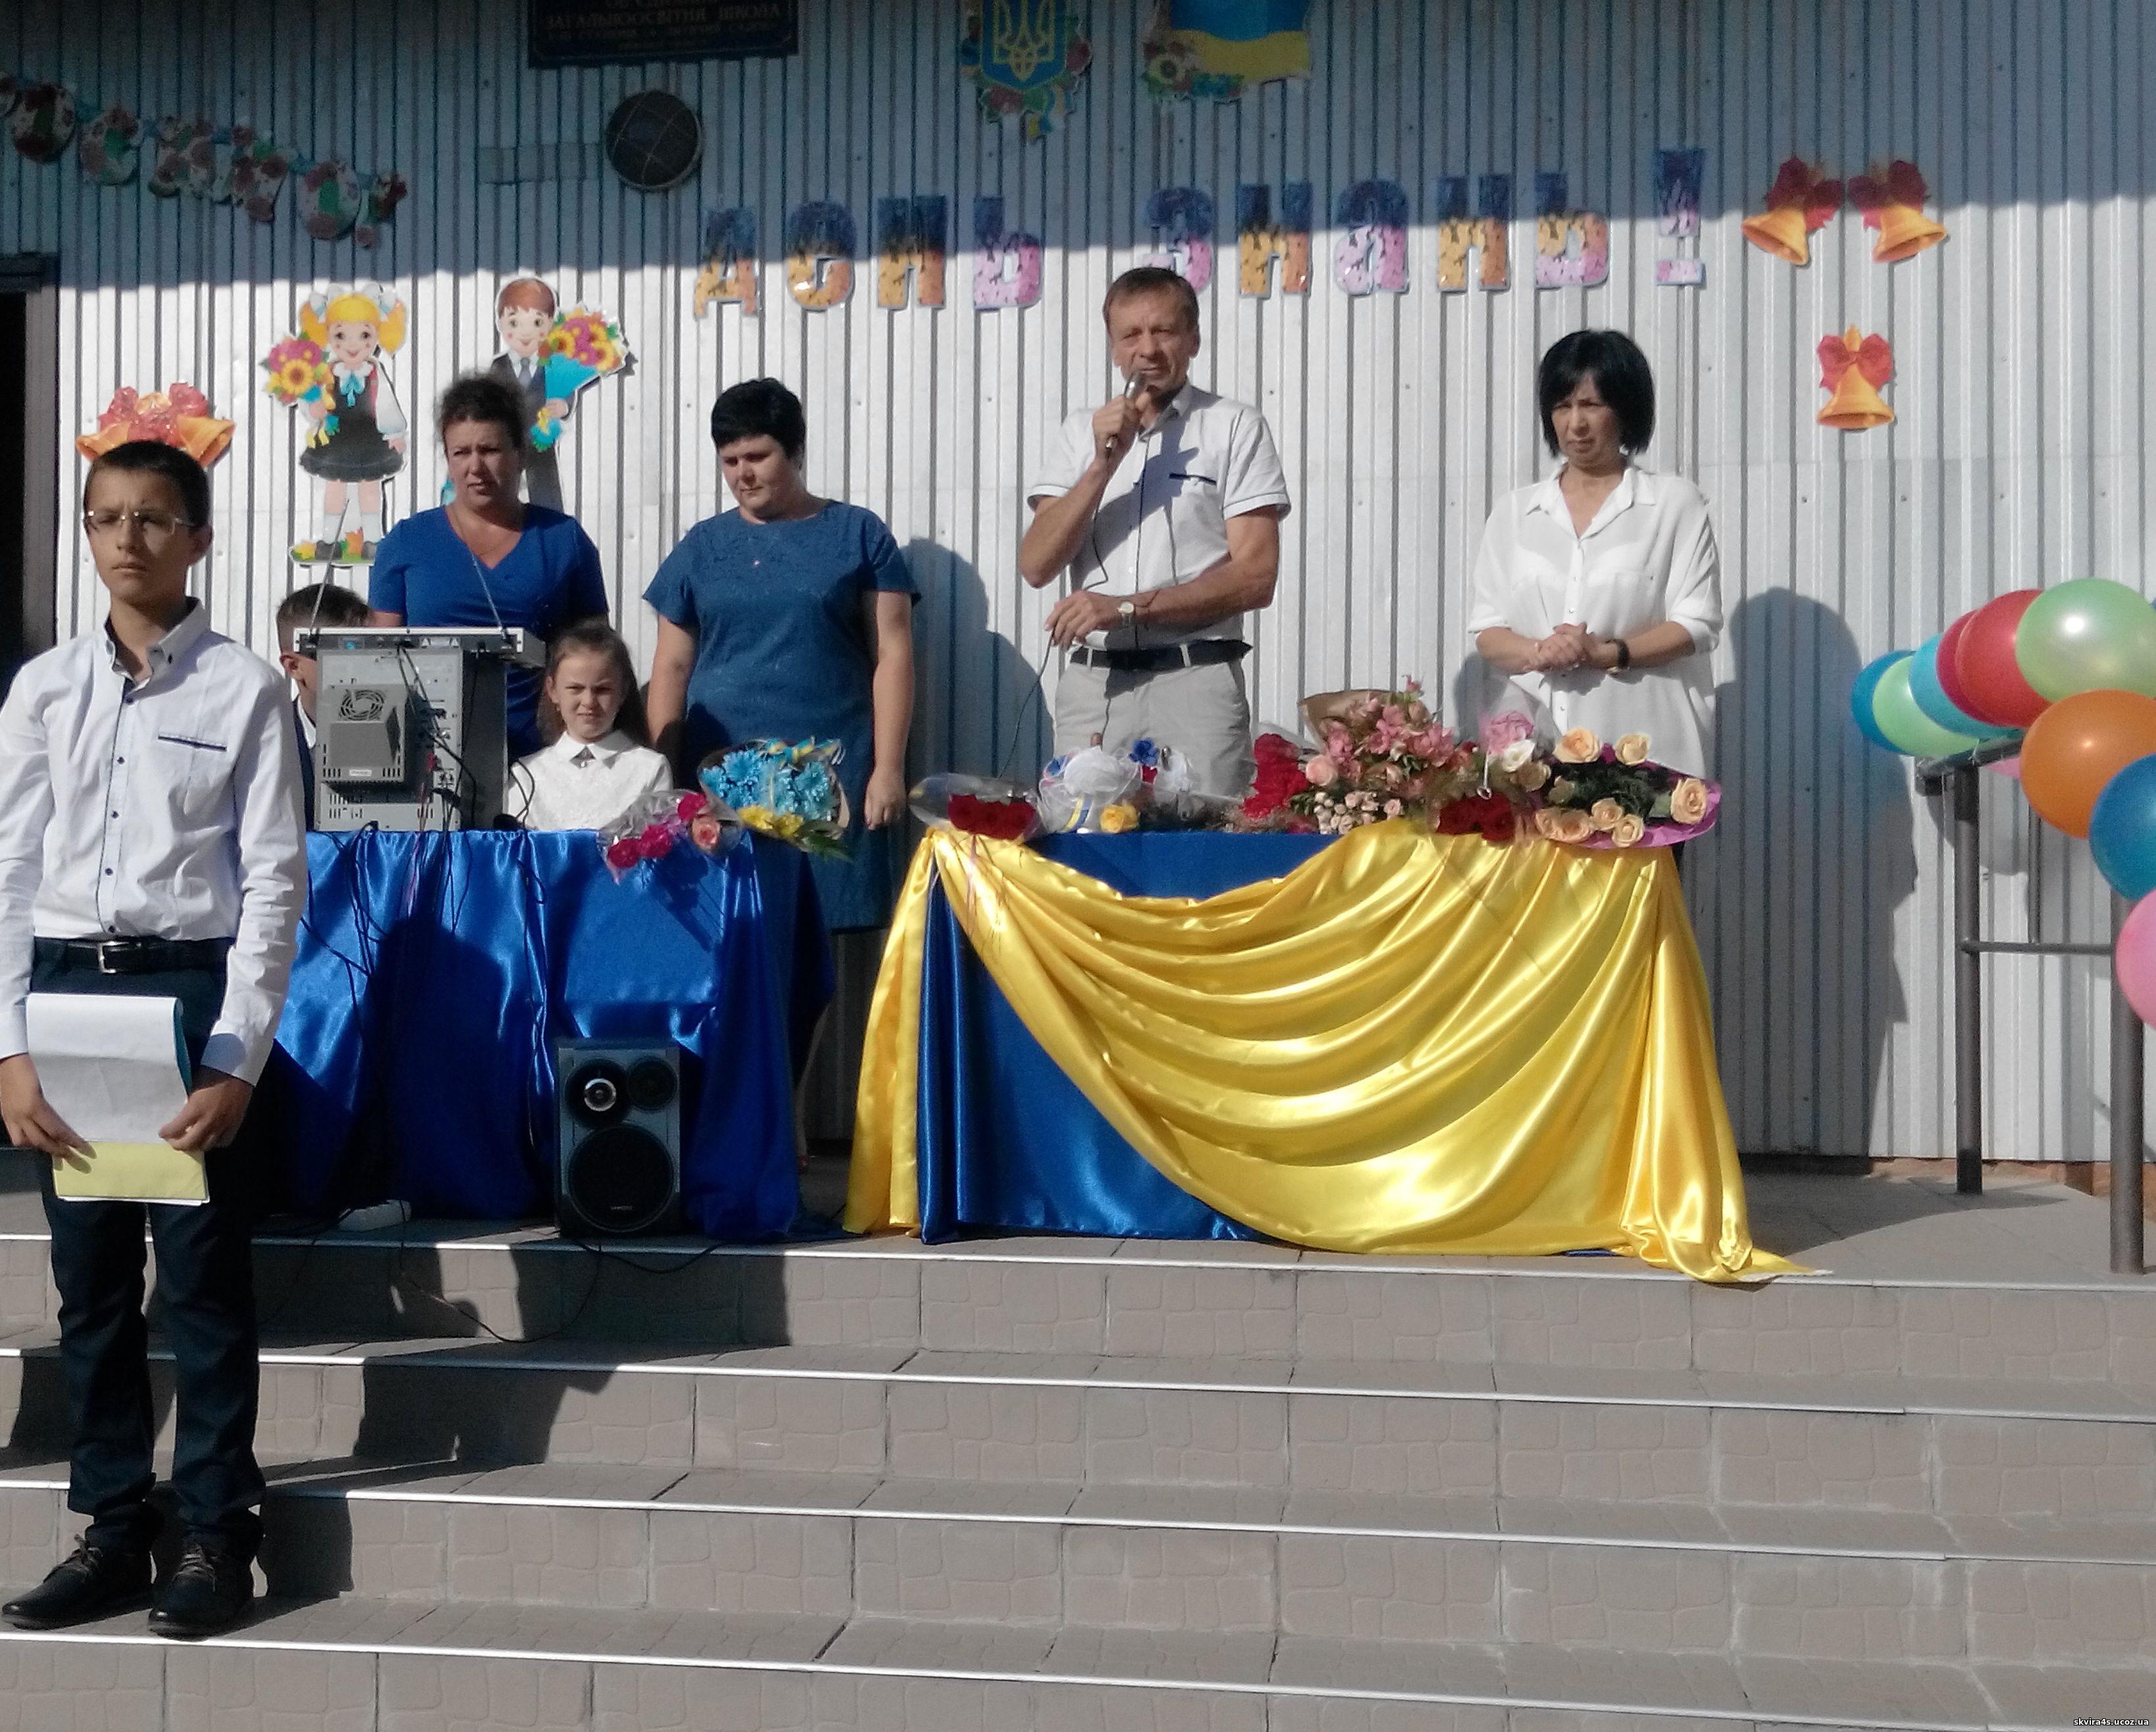 http://skvira4s.ucoz.ua/foto/01-09-2017/2017901091859.jpg